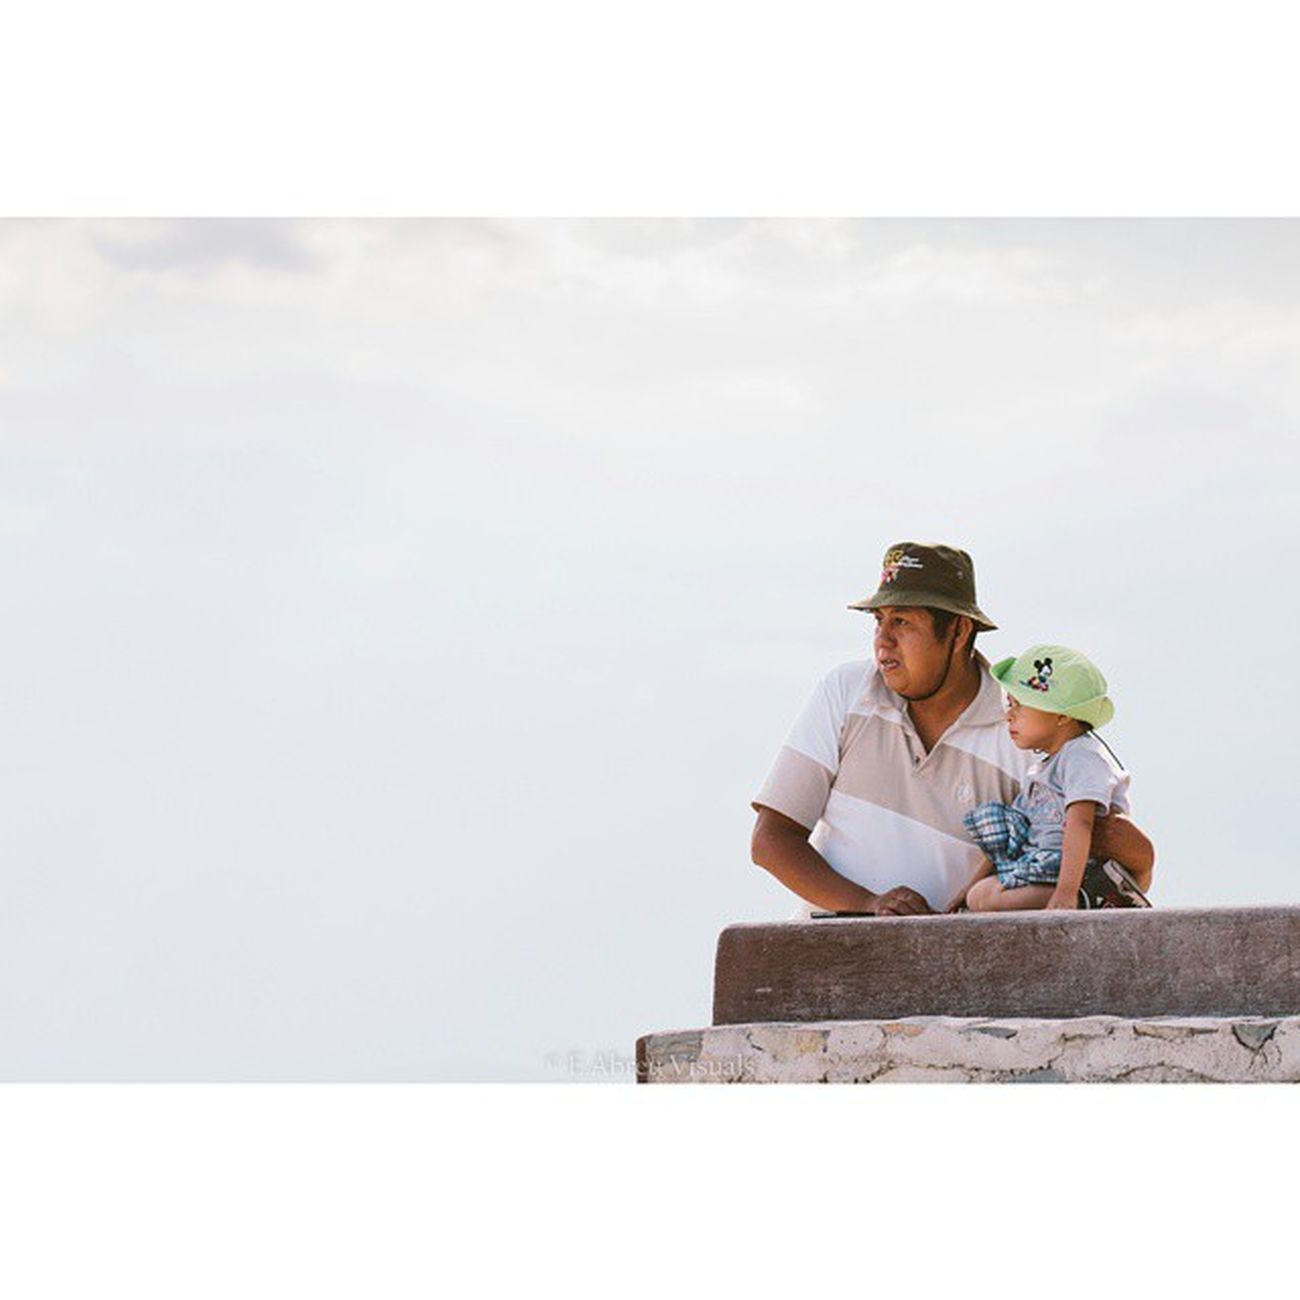 Mi hijo Eabreumexico Chapala Jalisco Residency photography artist mexico family